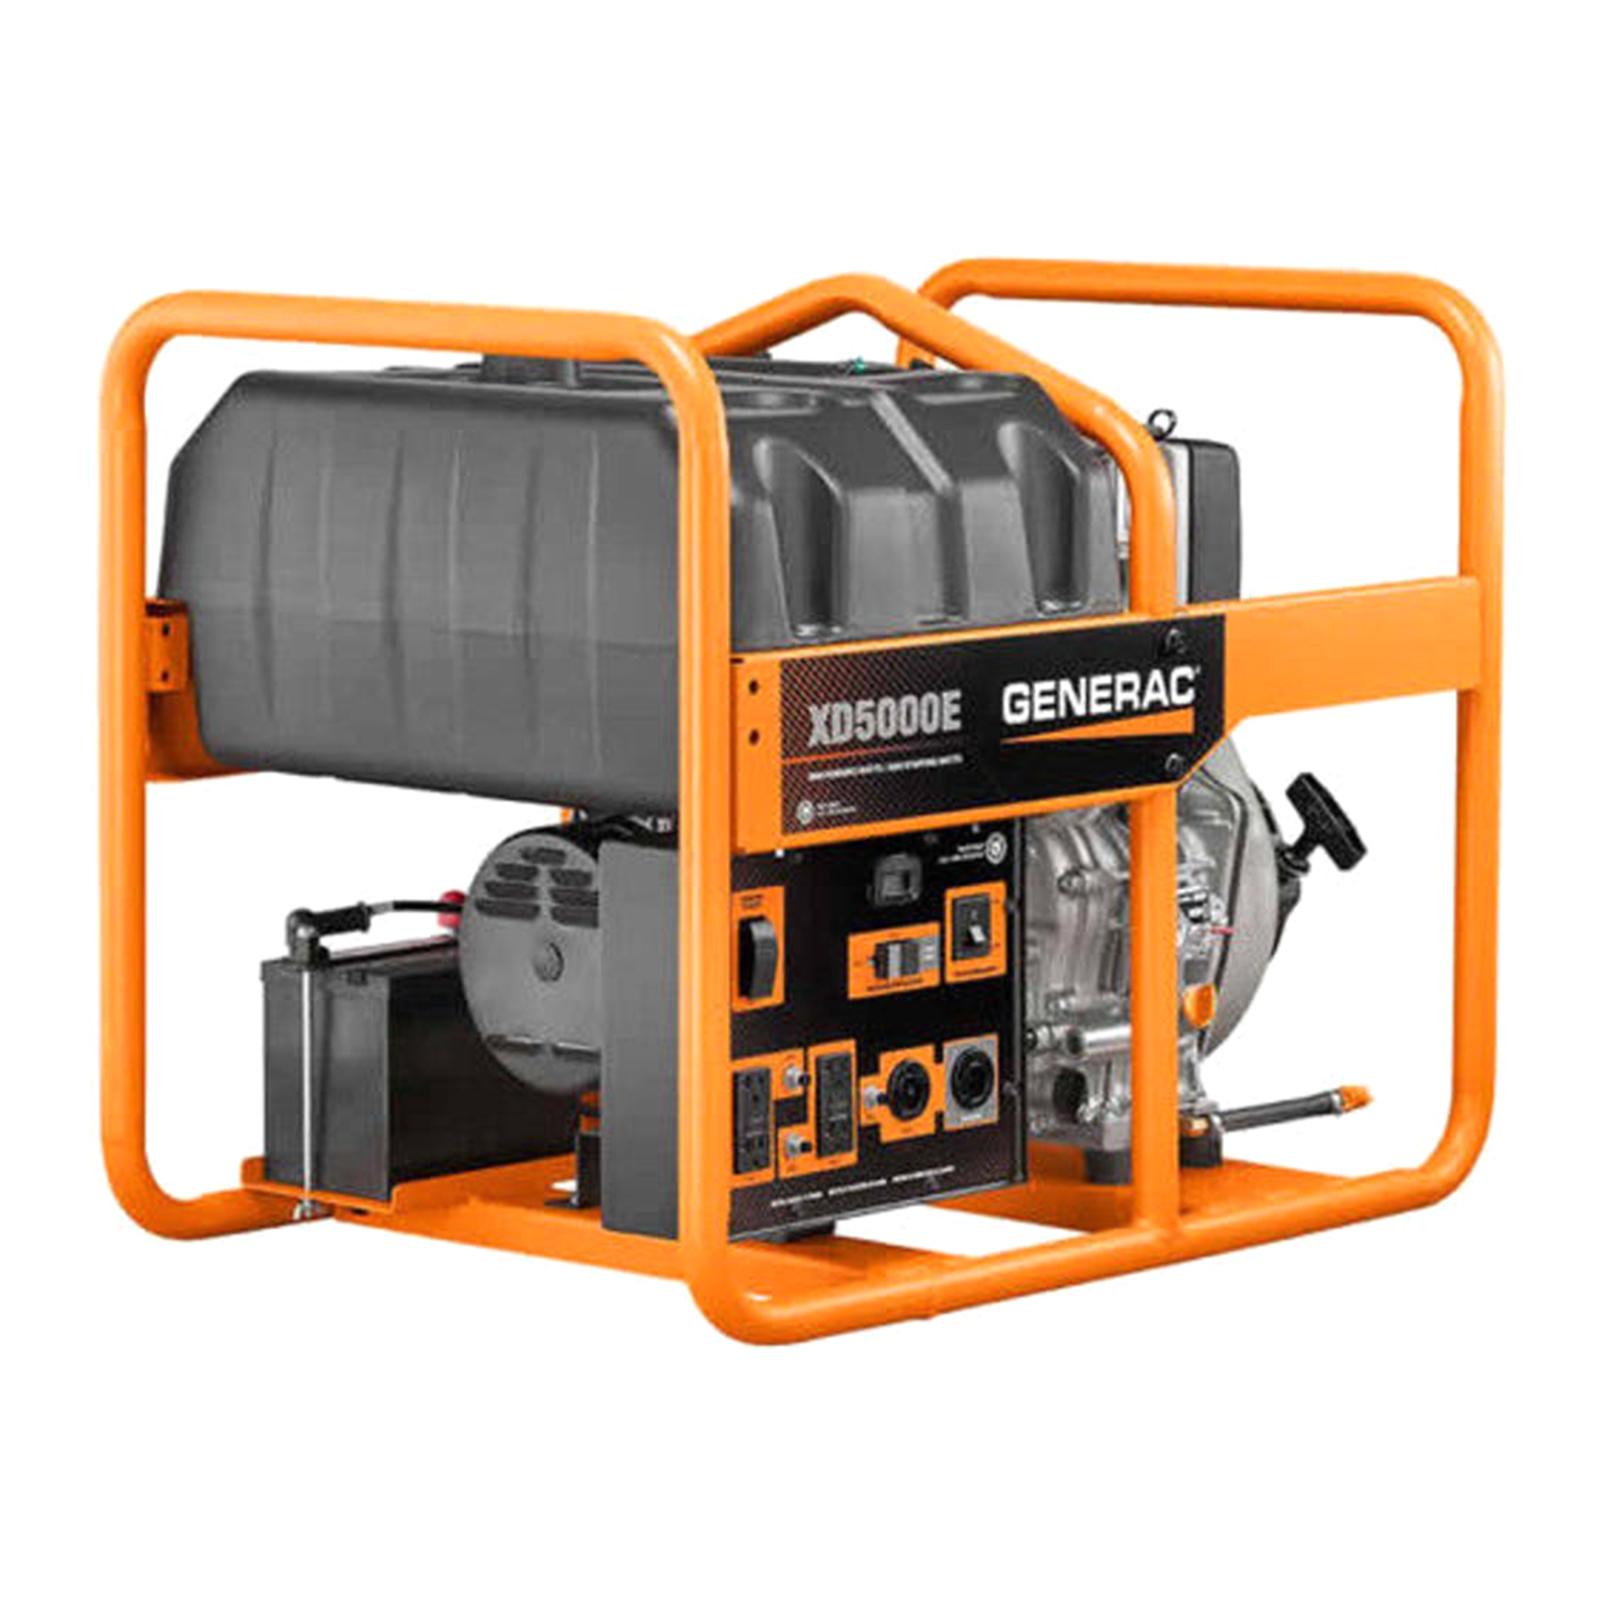 generac 6864 xd5000e 5000w electric start diesel portable generator [ 1600 x 1600 Pixel ]